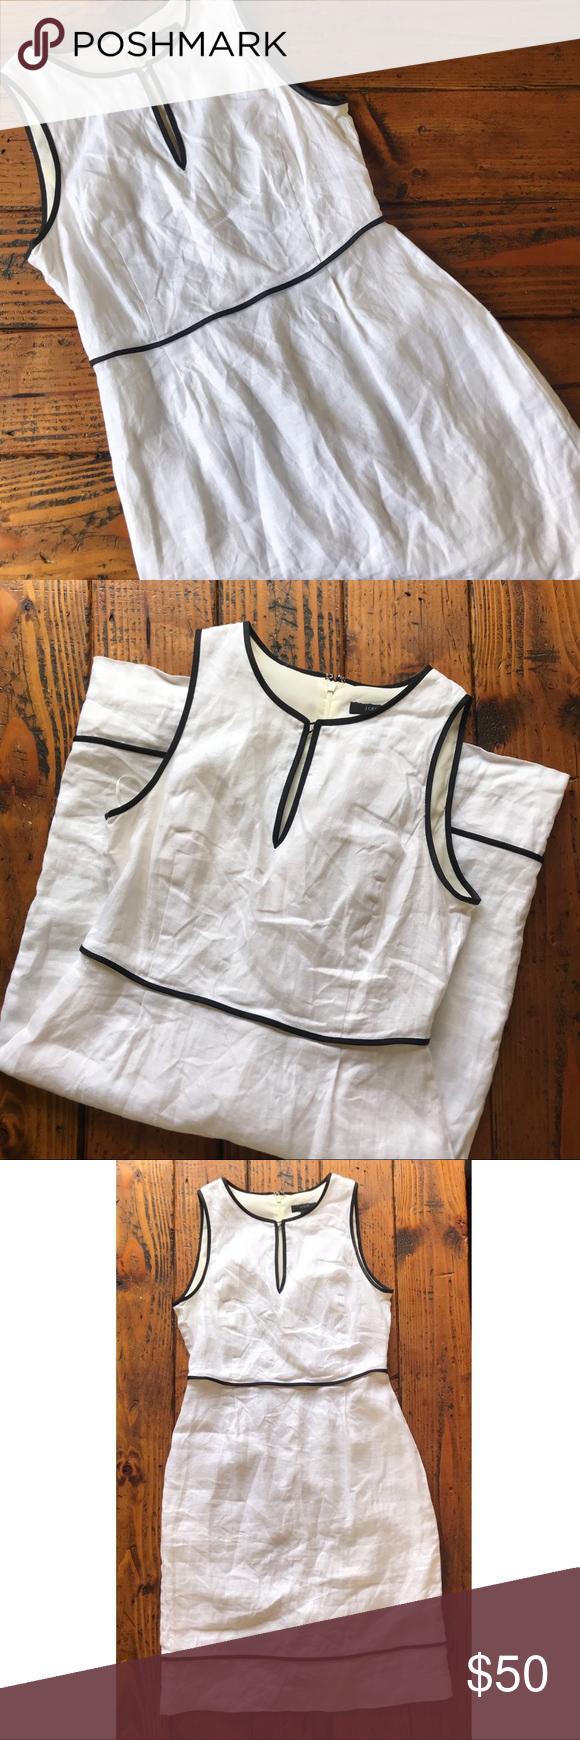 J. Crew linen dress Timeless linen sundress from J. Crew. White with black pipin…